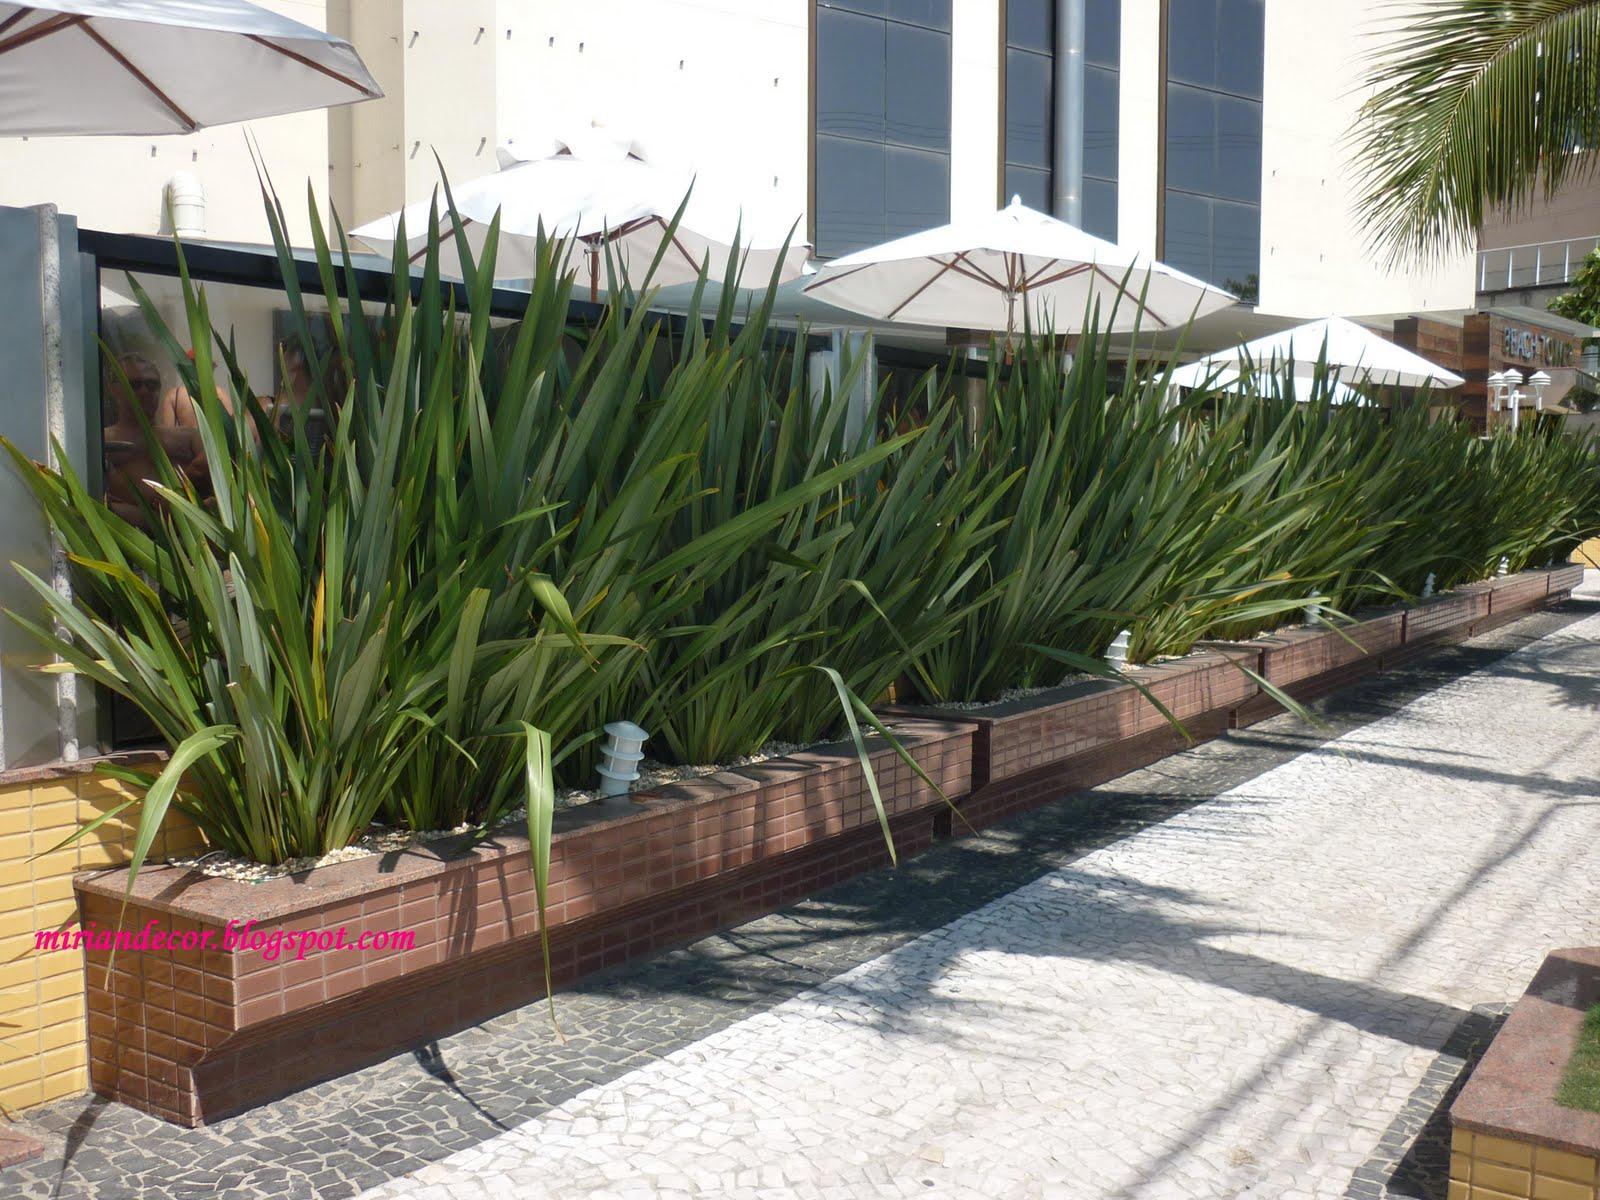 Mirian decor jardim para muros internos e de fachadas for Tipos de muros verdes